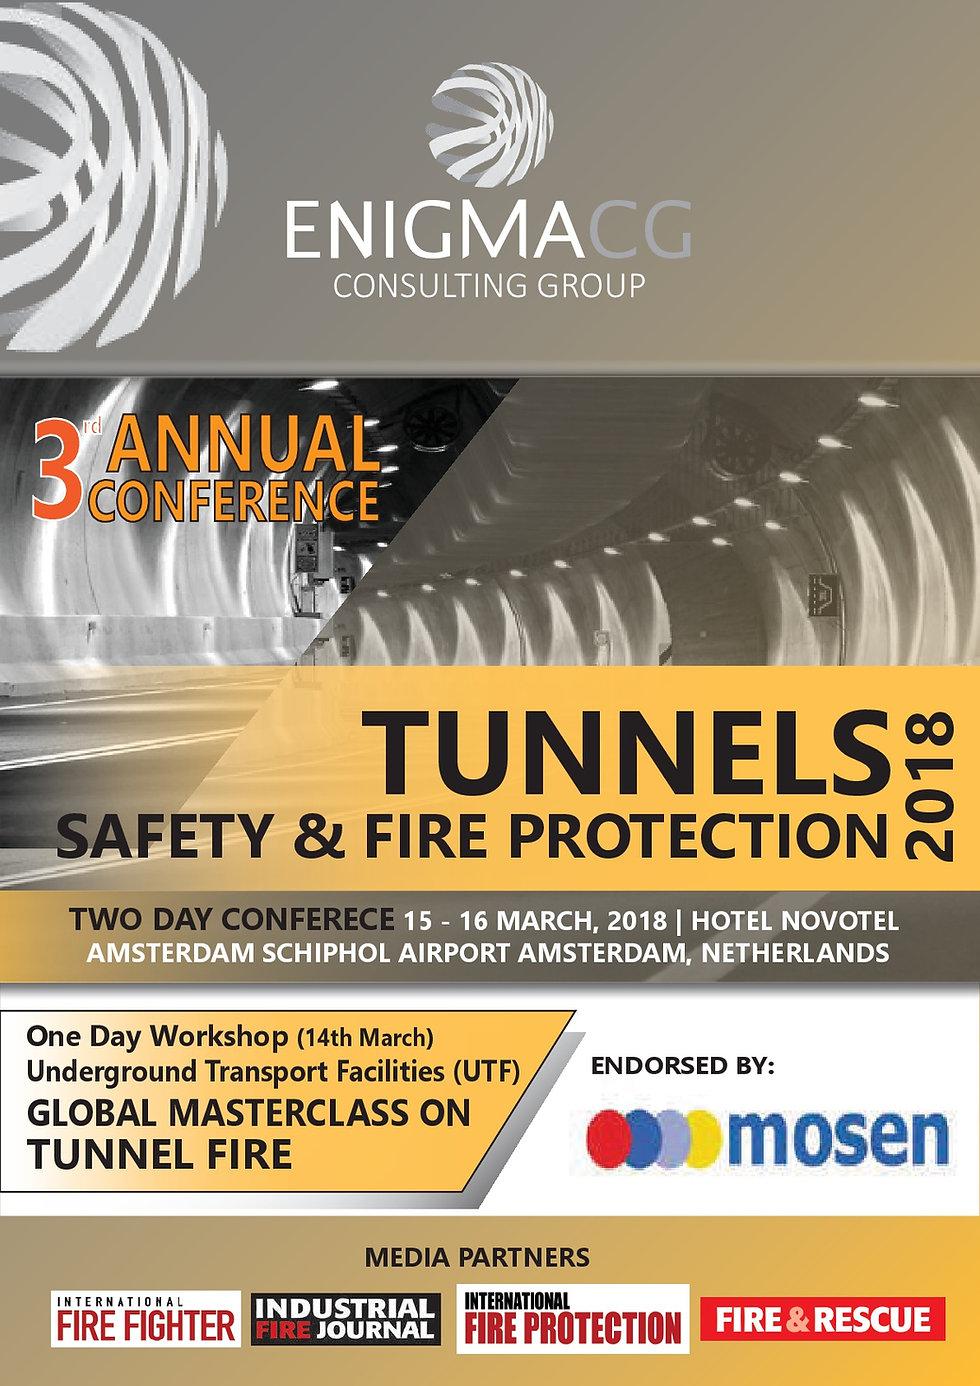 tunnels-2018-ilovepdf-compressed-001.jpg